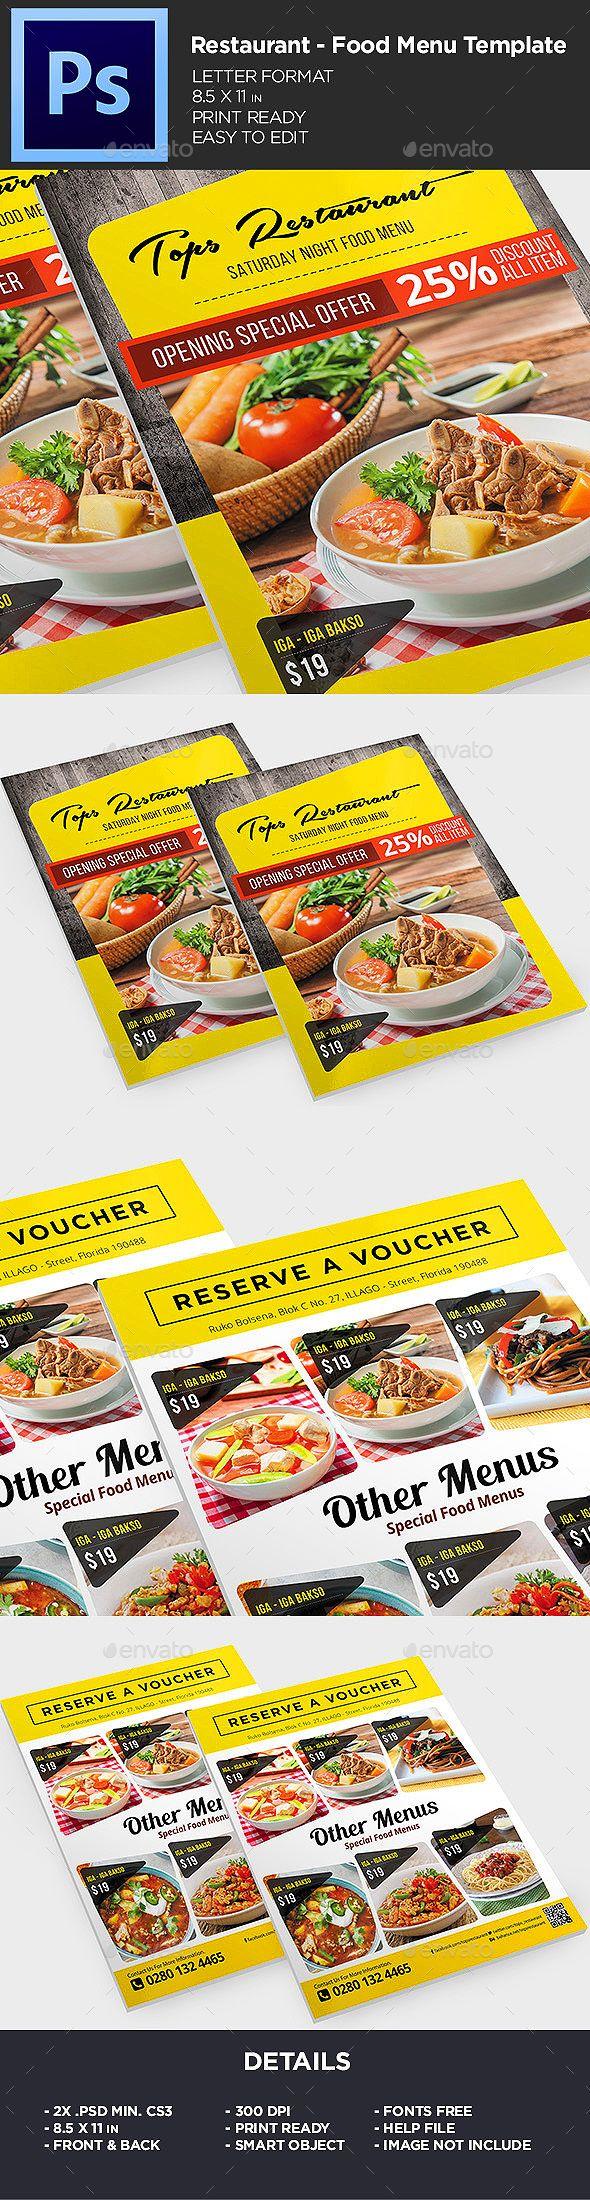 Menu - Food Menu Flyer